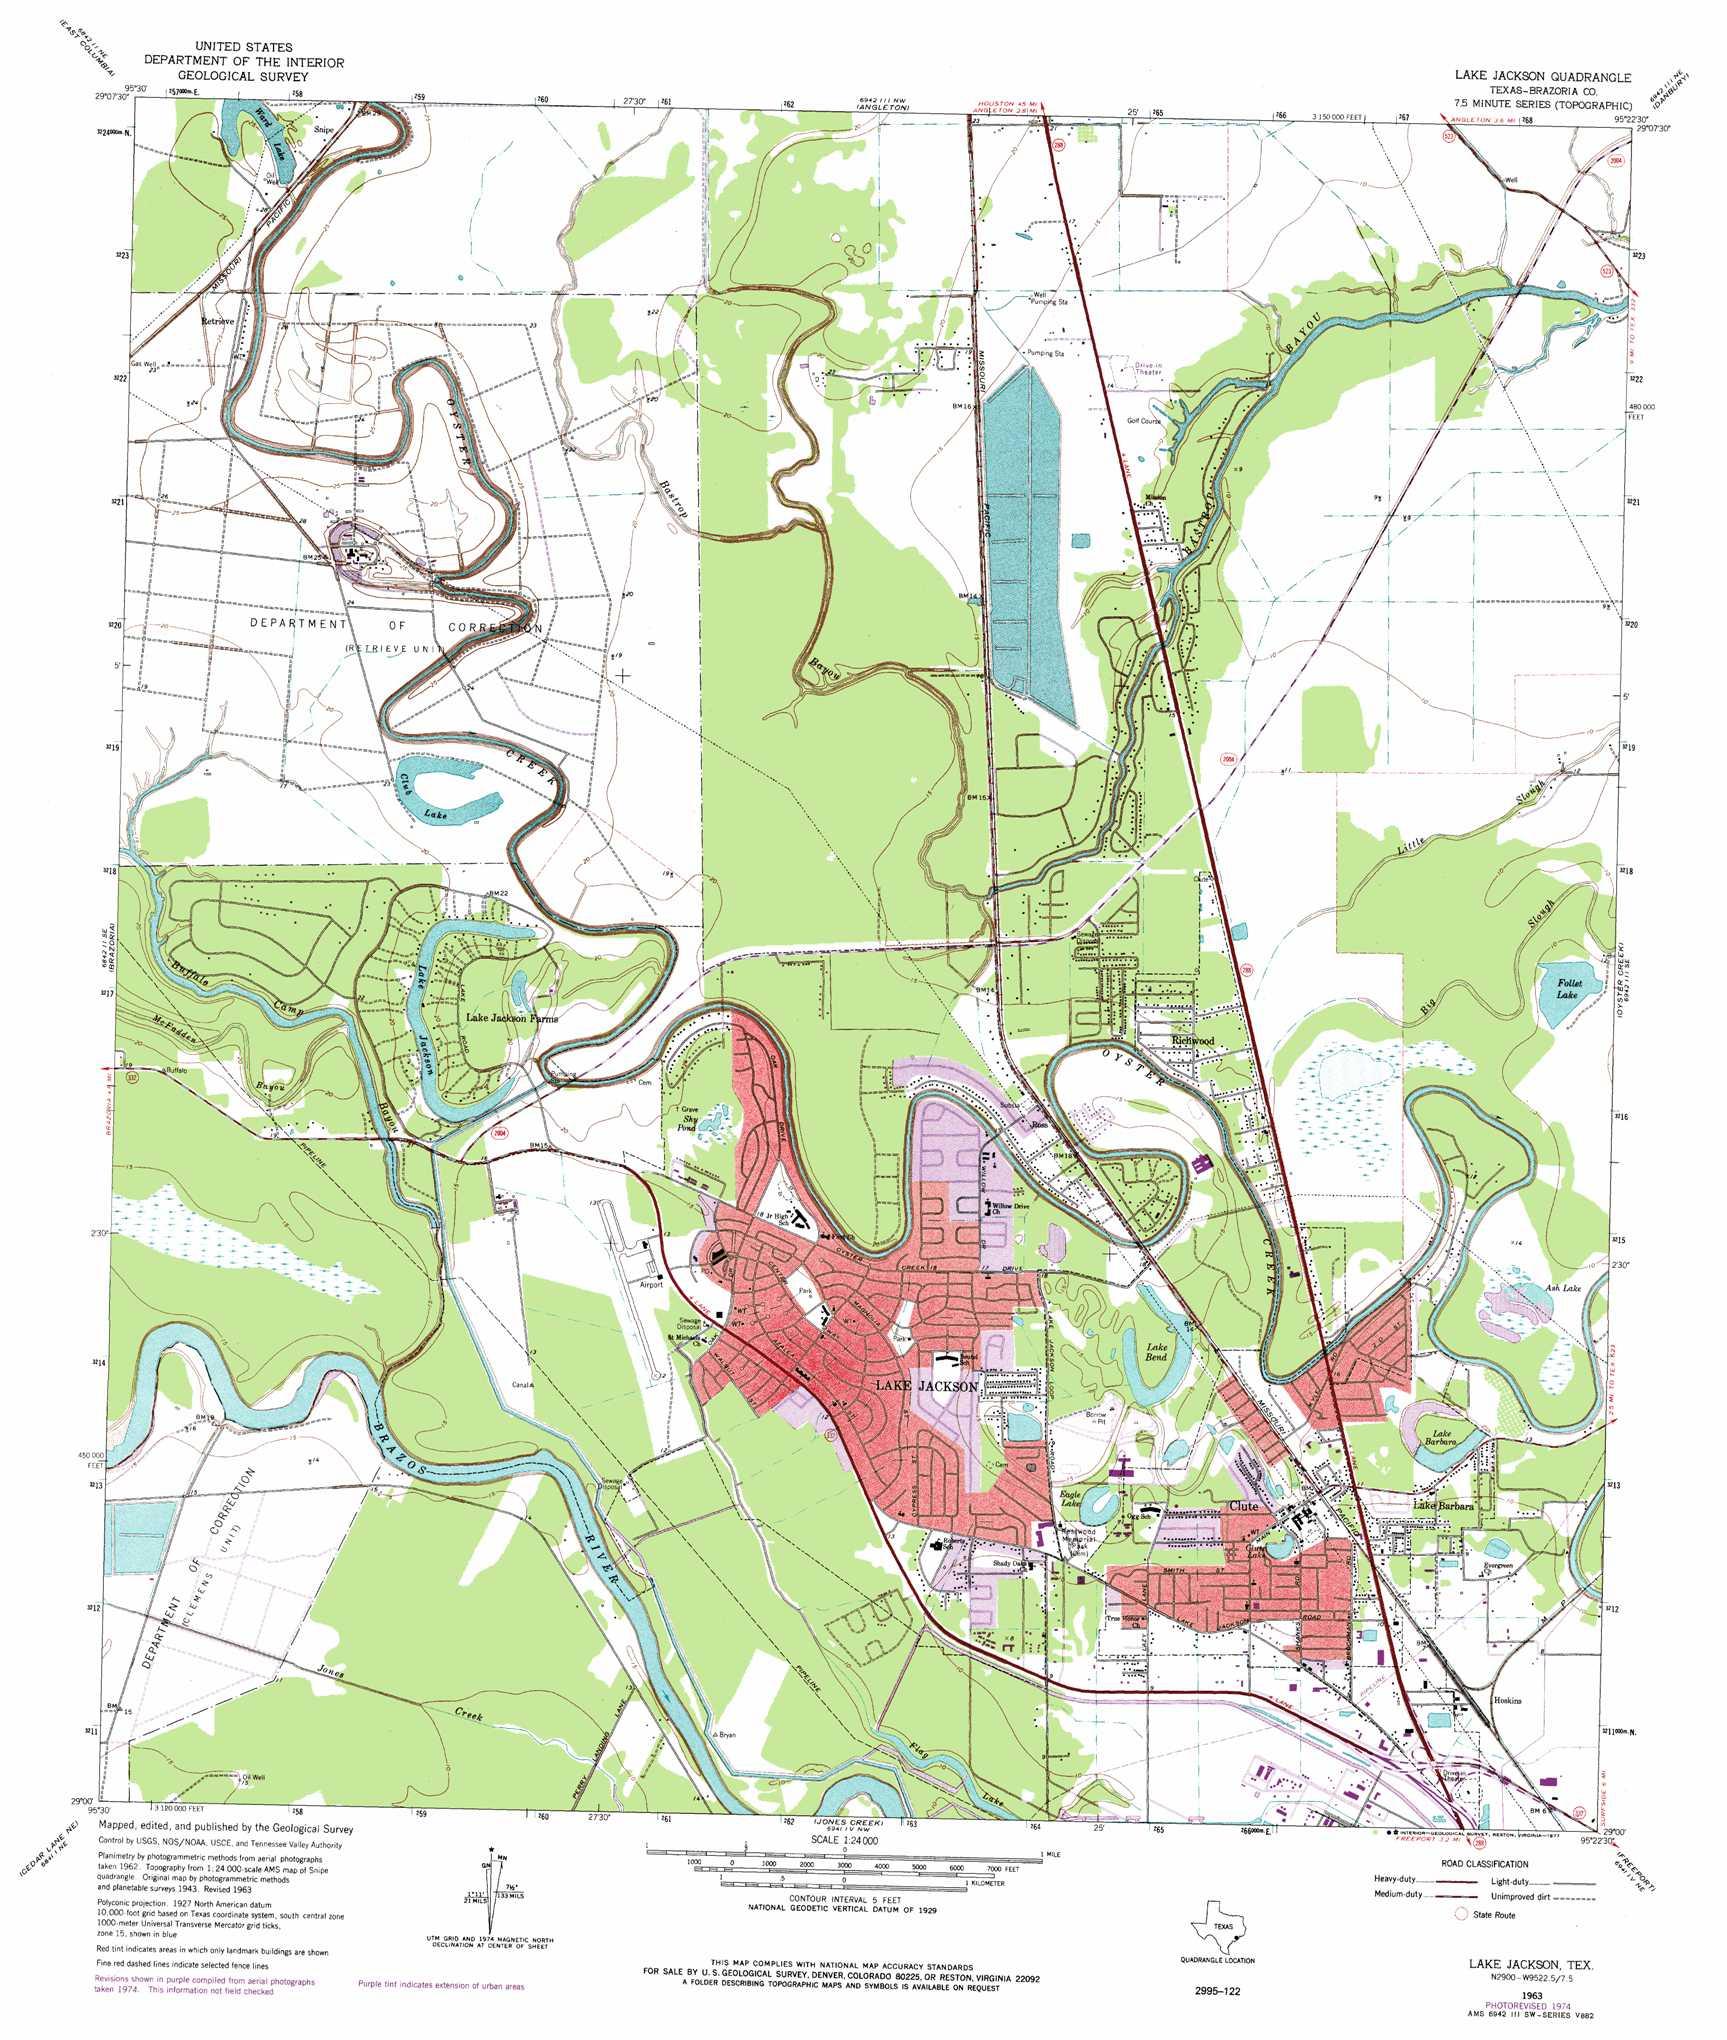 lake jackson tx map related keywords suggestions lake jackson buy this lake jackson topo map as a high resolution digital